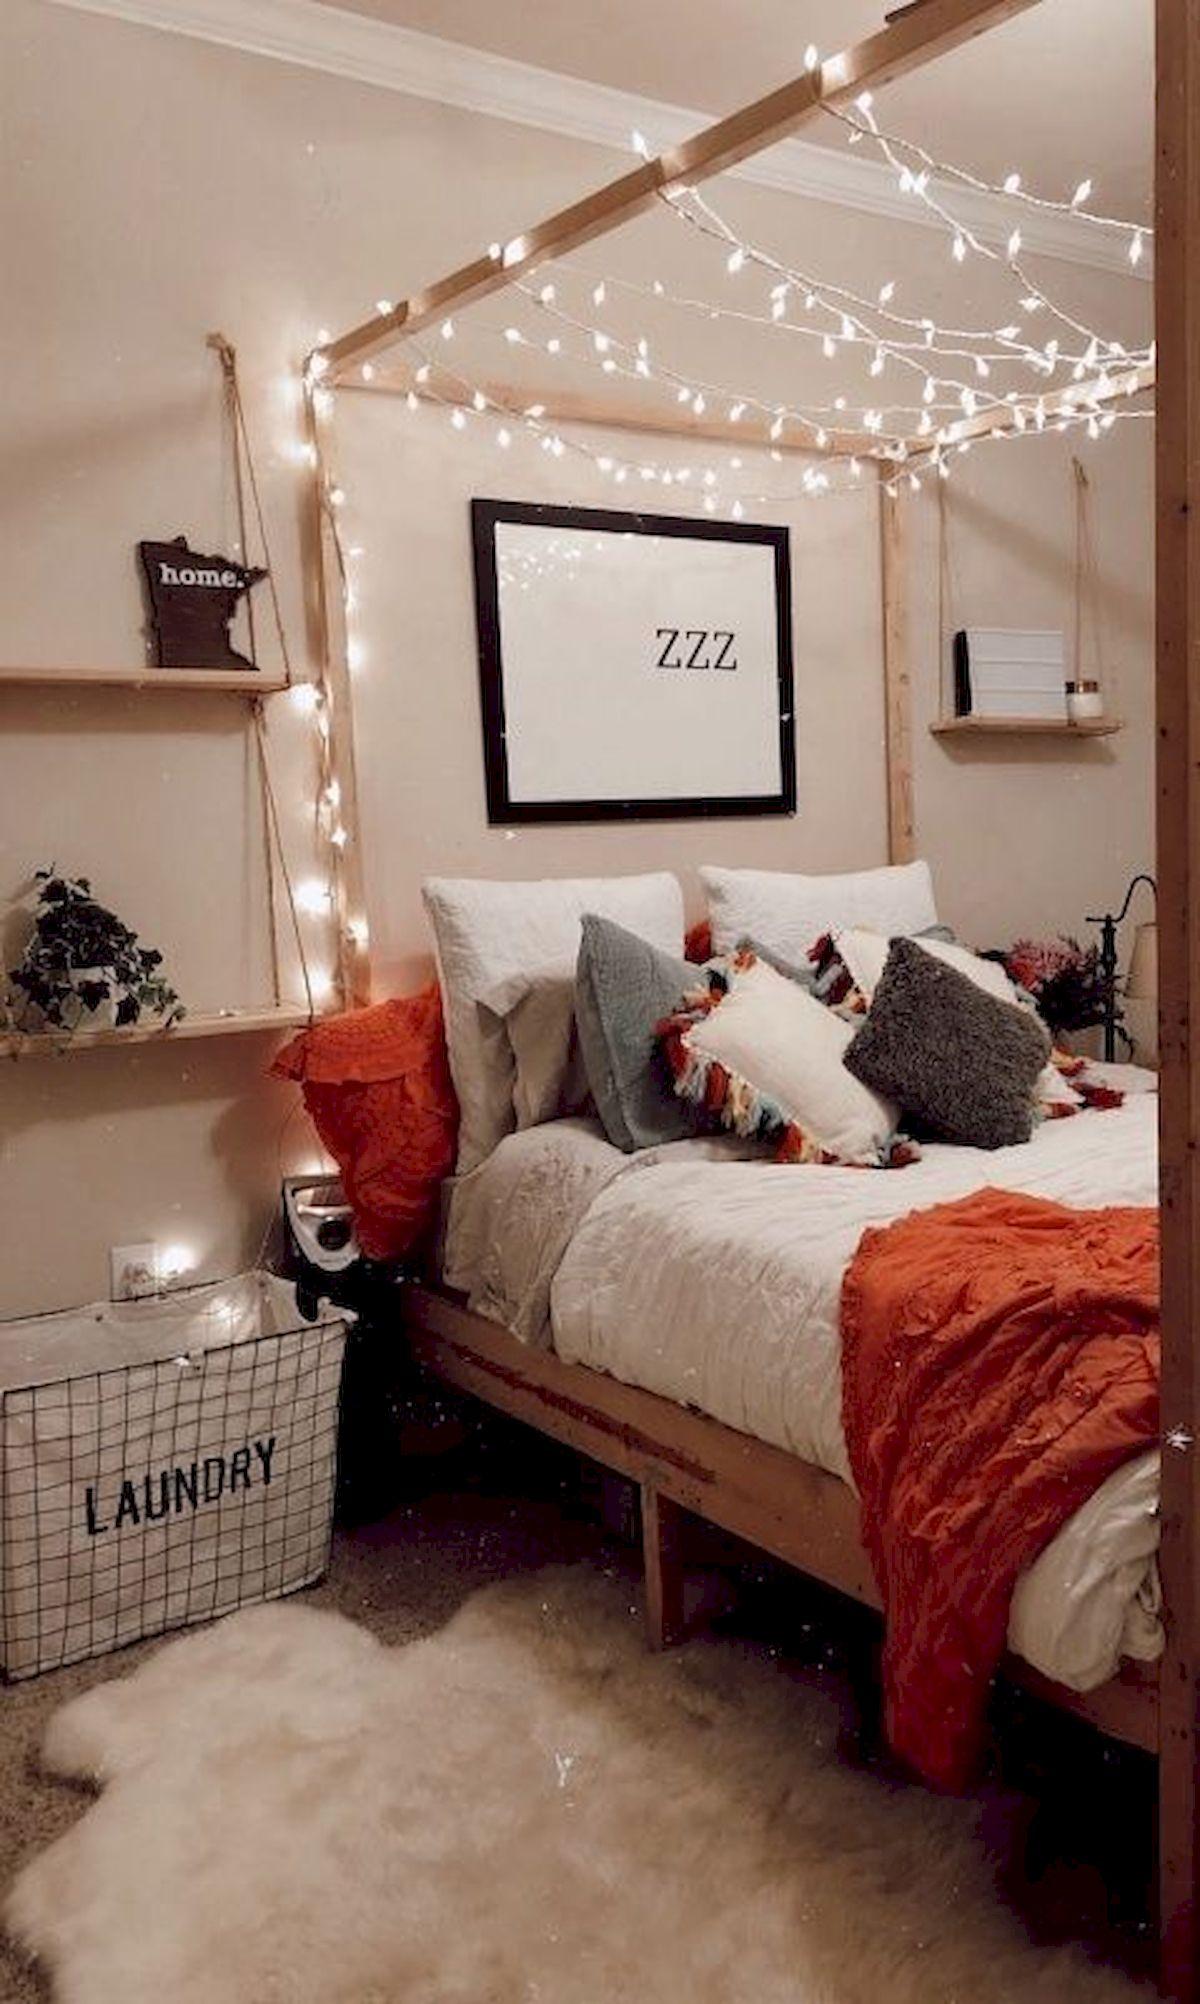 45 Beautiful Bedroom Decor Ideas for Teens (7)